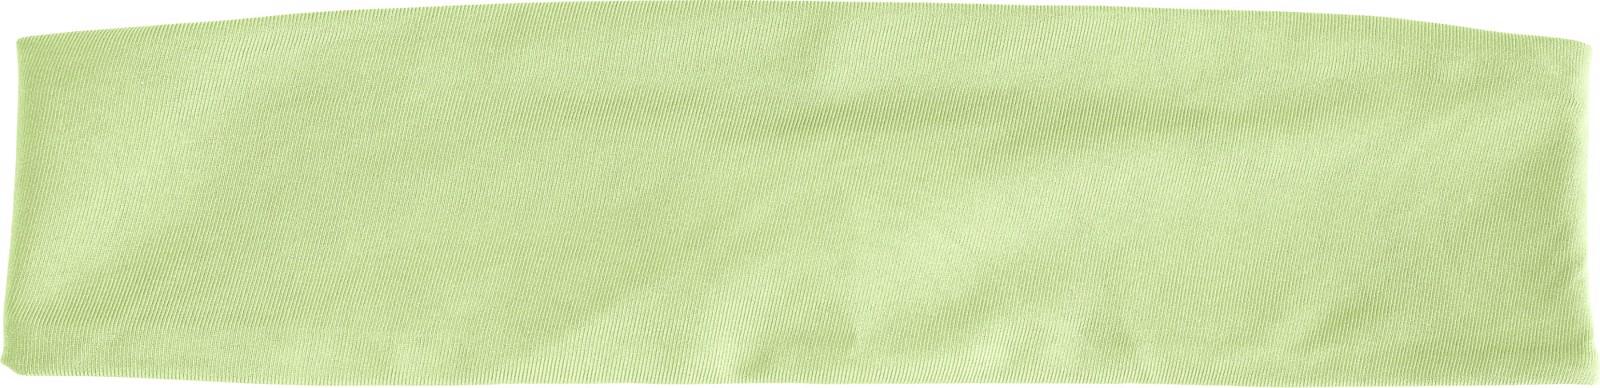 Polyester headband - Lime